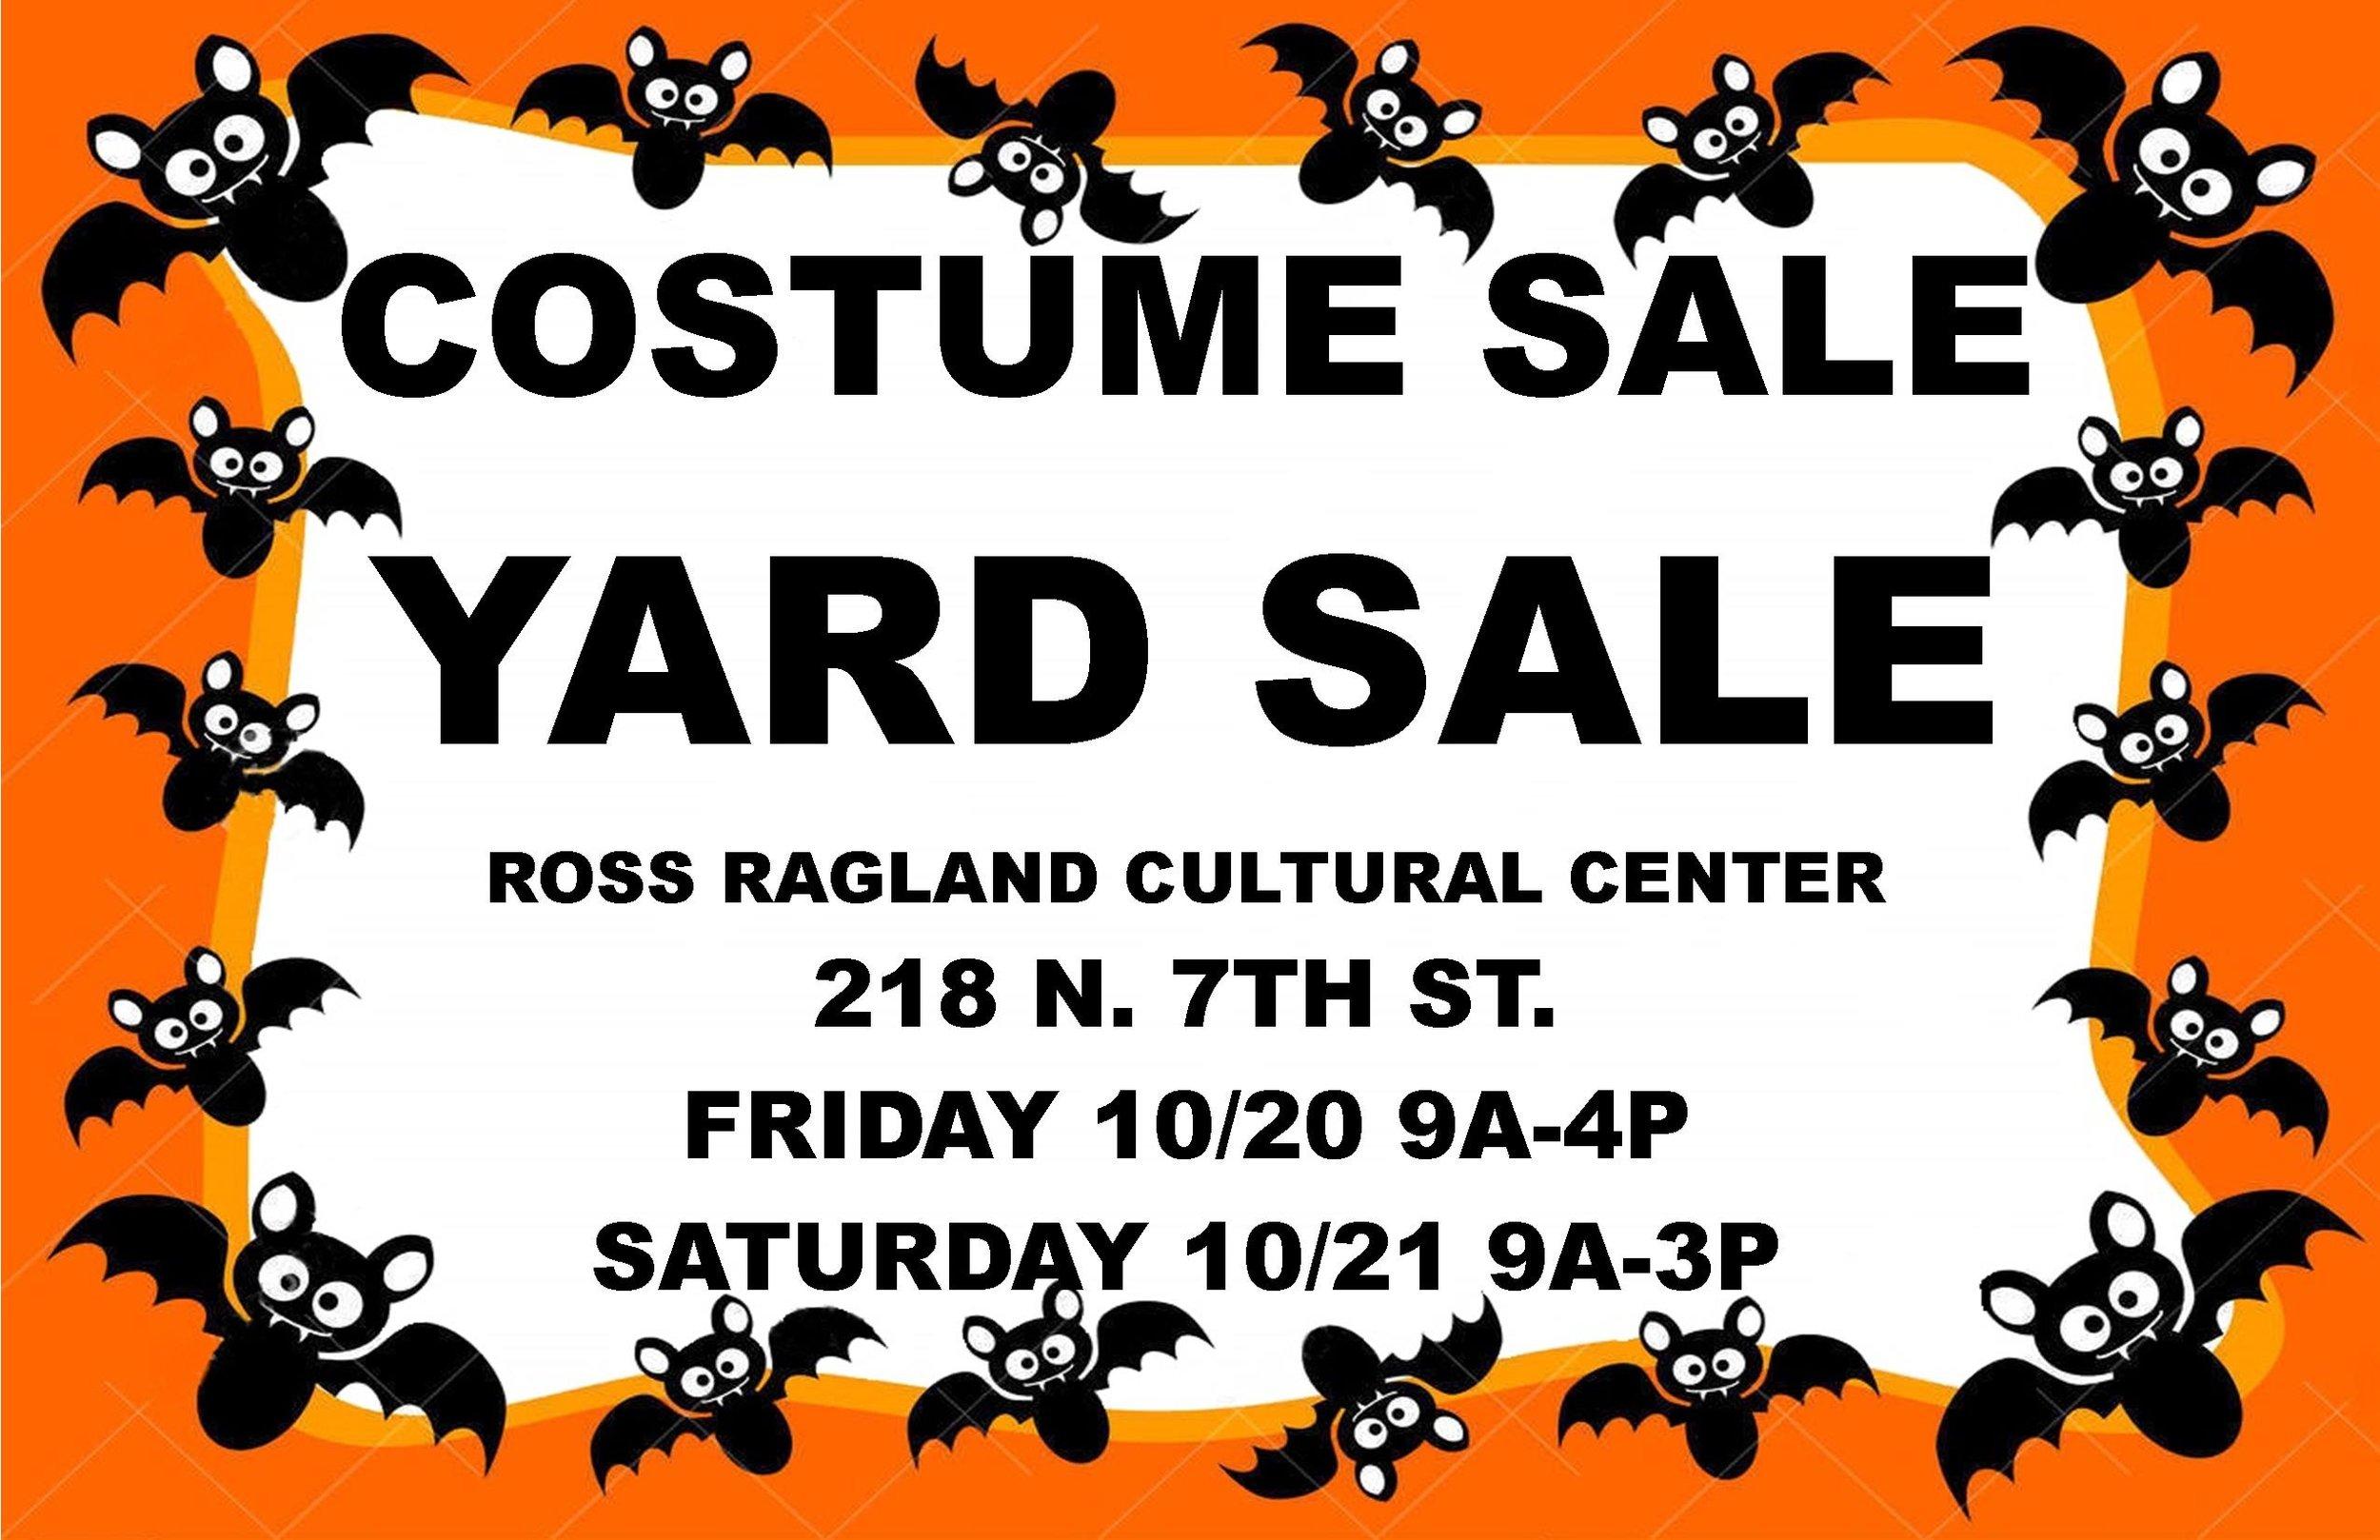 Yard Sale Sign #1.jpg